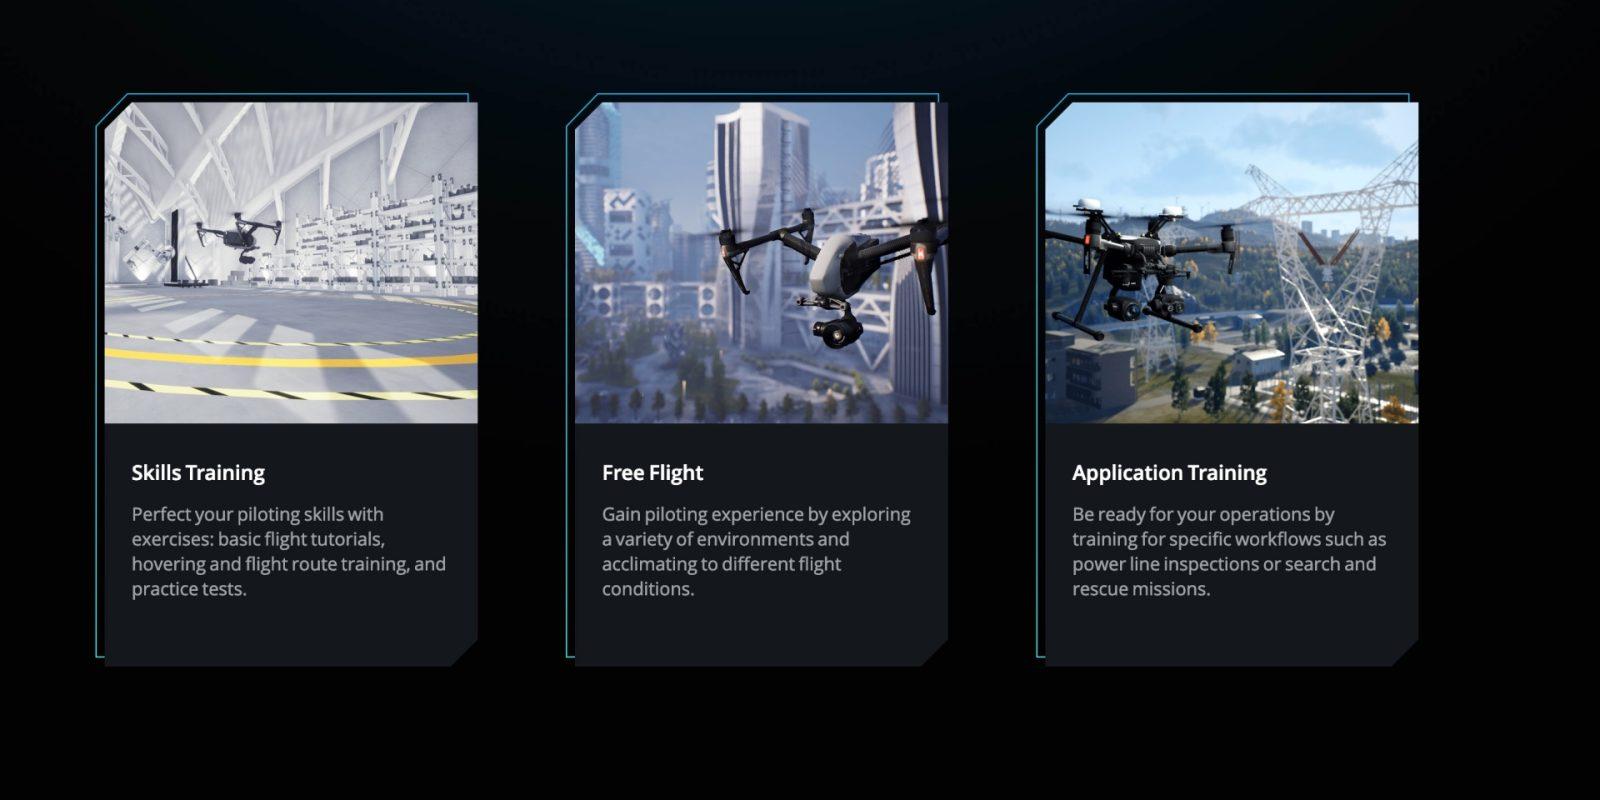 DJI Flight Simulator software - DJI releases new version